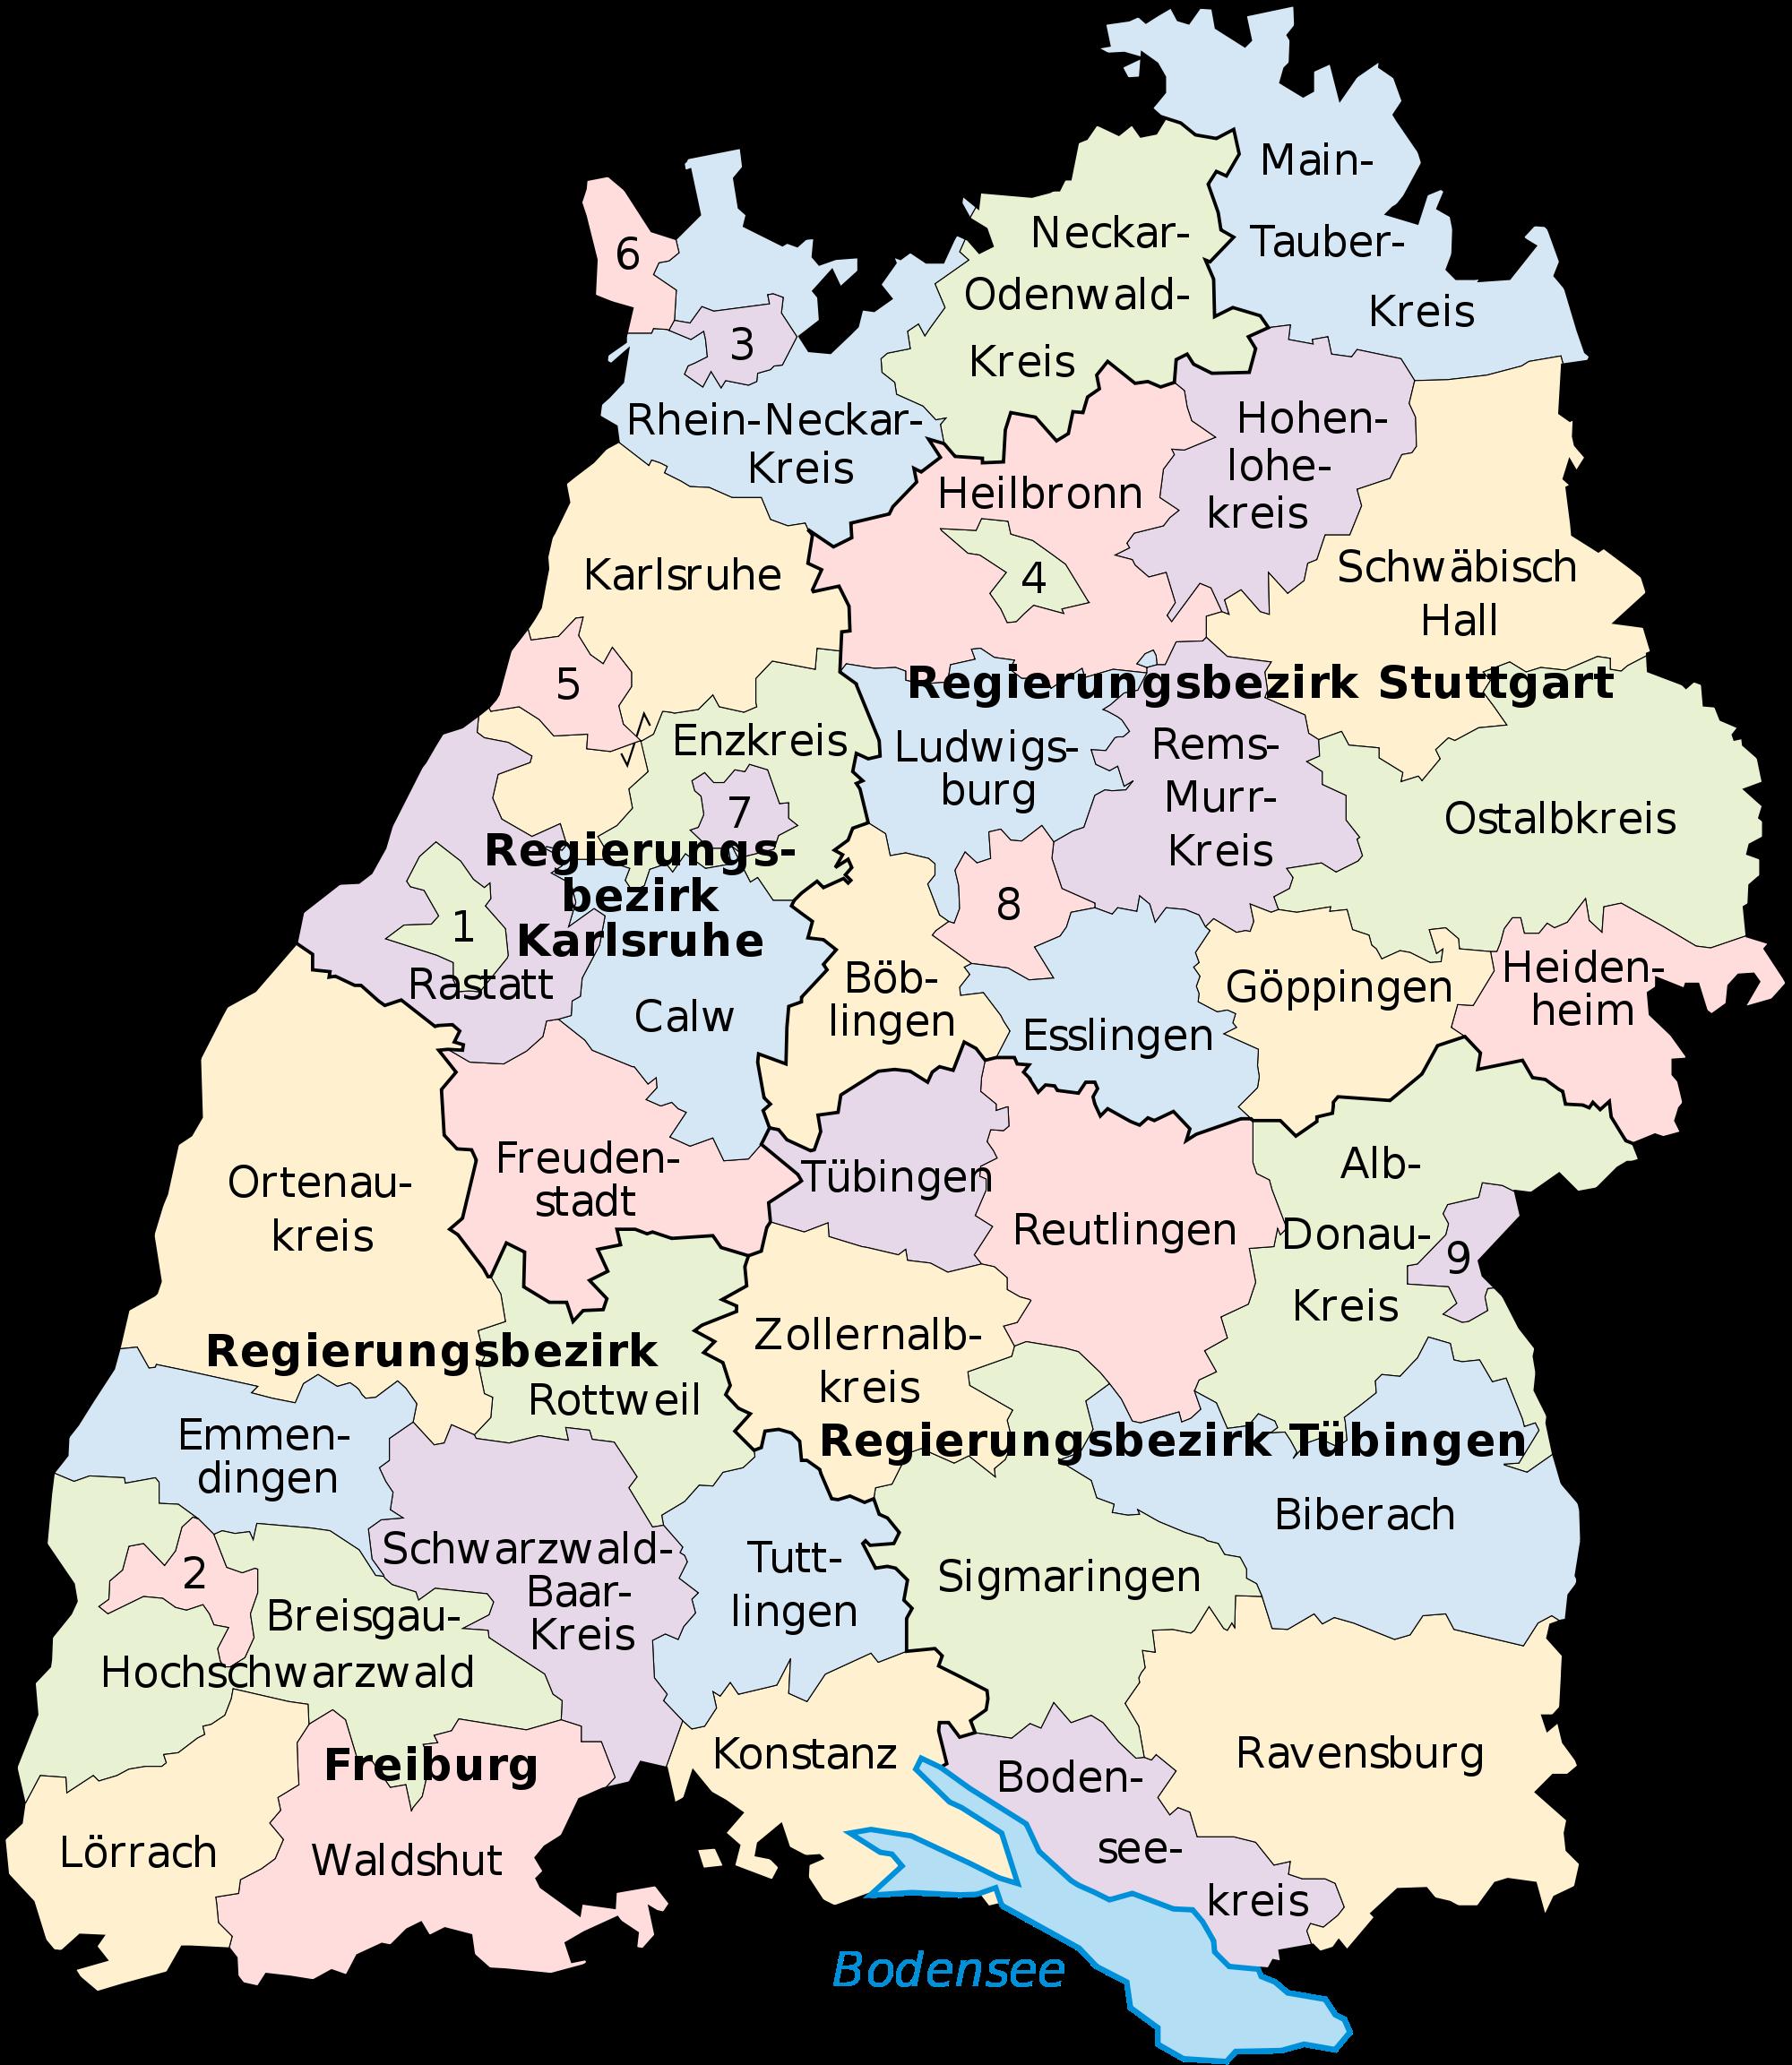 Map of Baden-Württemberg 2008